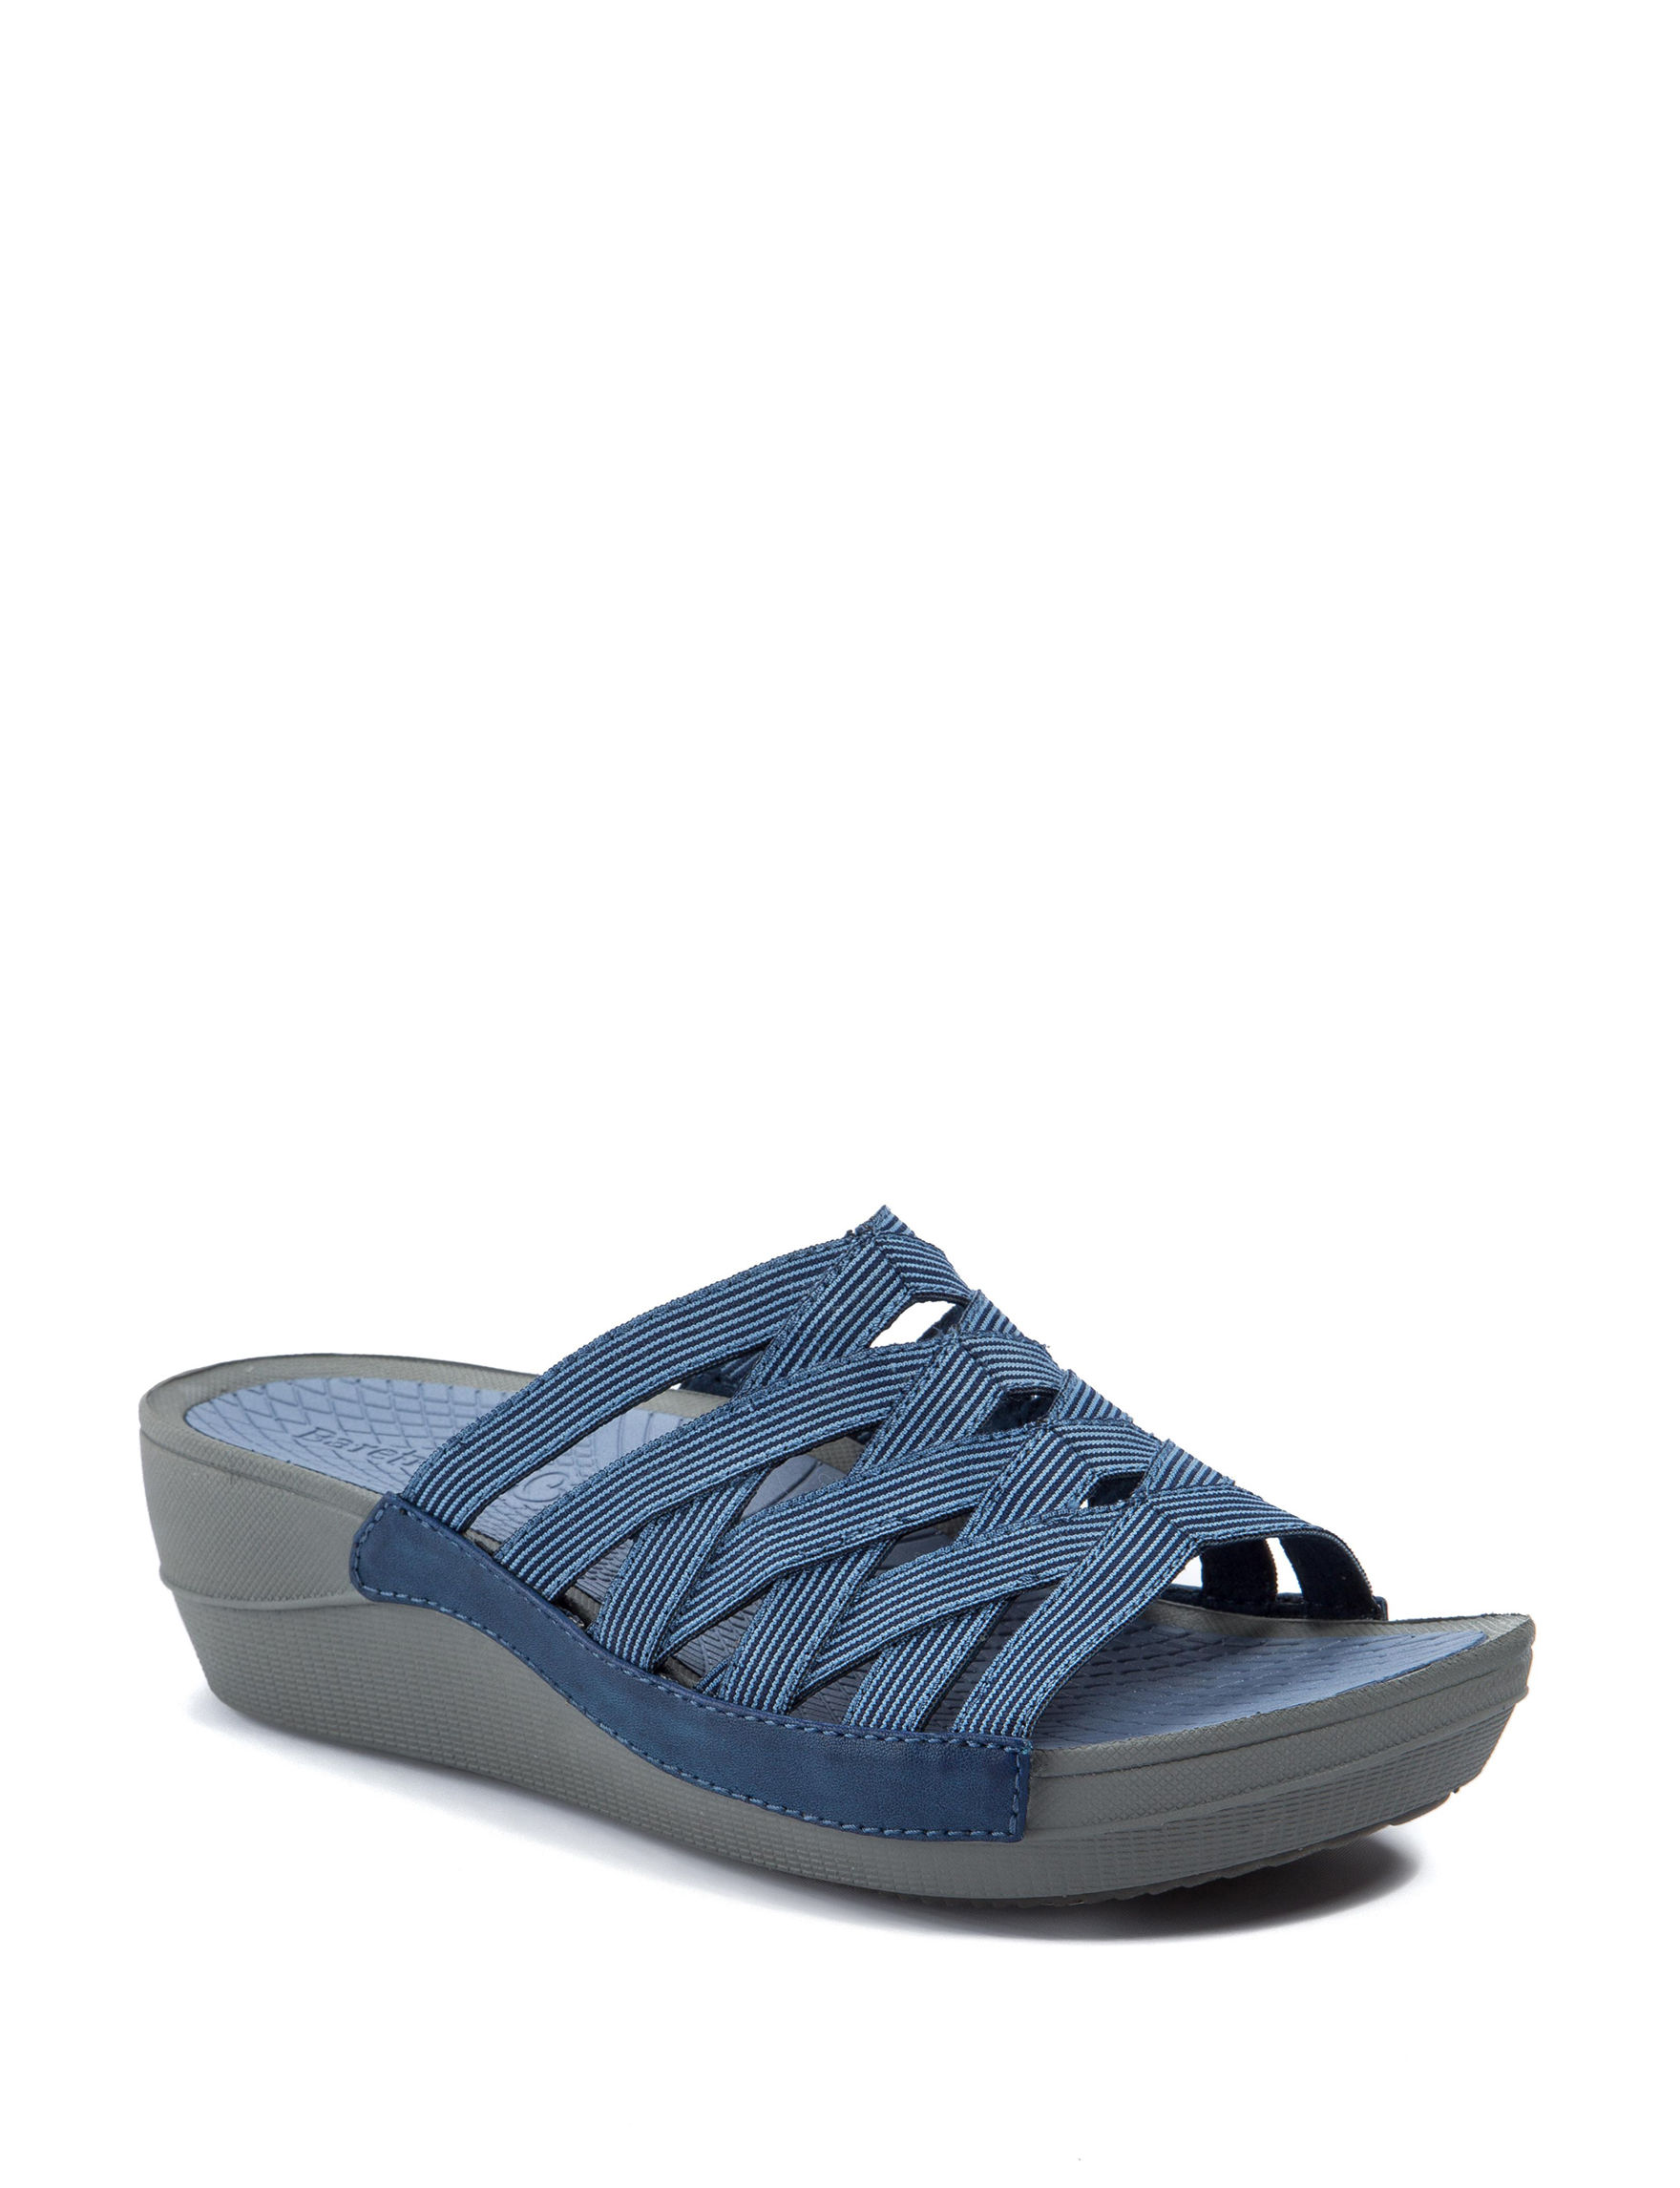 Baretraps Denim Flat Sandals Wedge Sandals Comfort